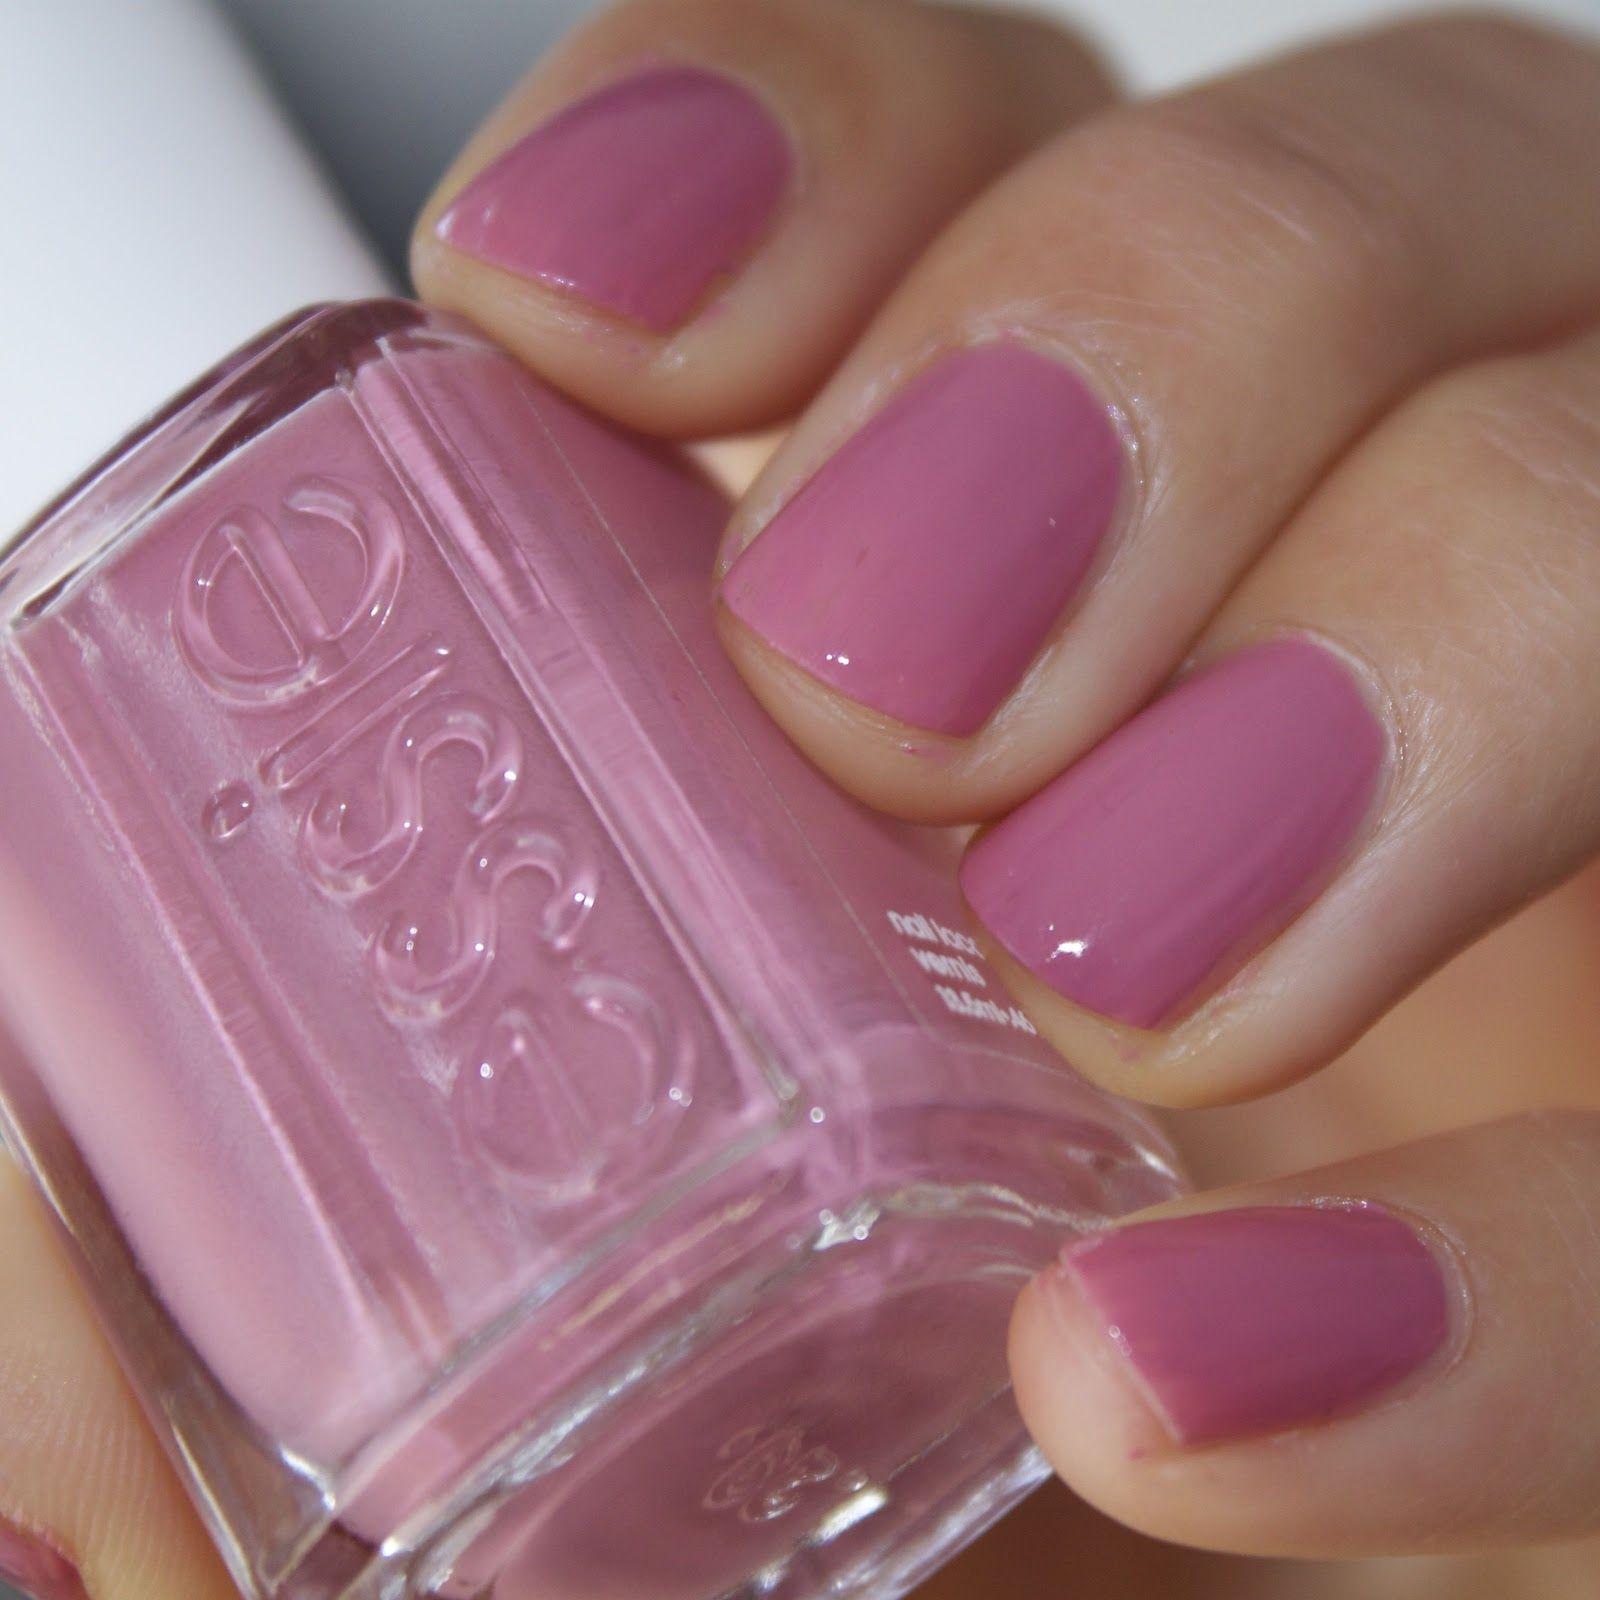 essie nail polish | essie marathin nail polish yogaga 2012 ...